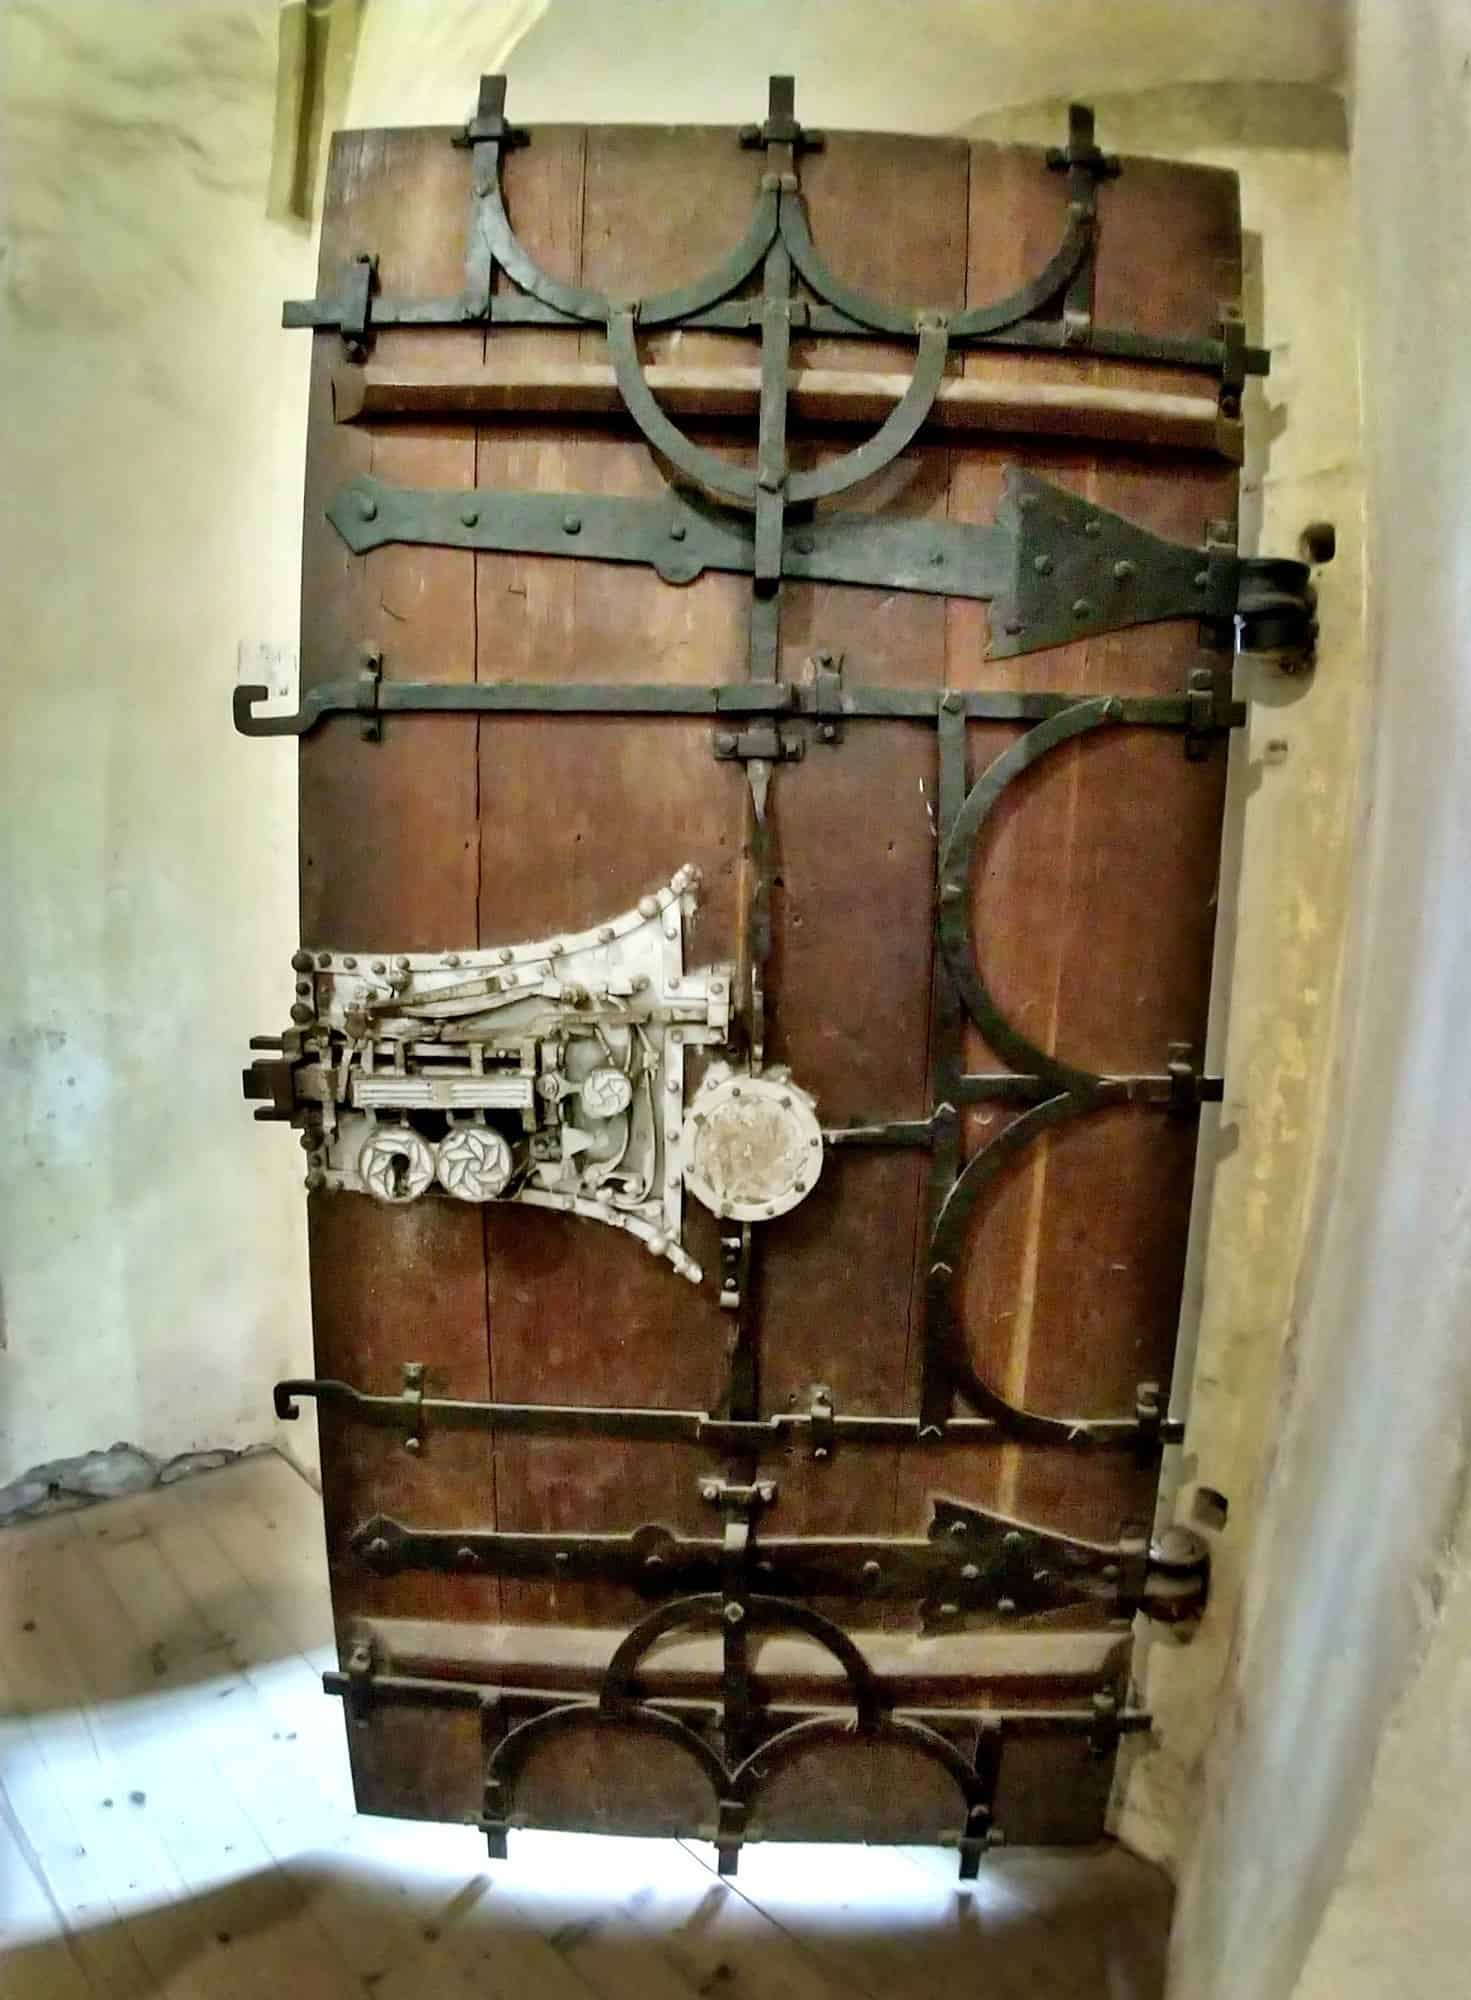 Biertan Transylvania Amazing Lock in Fortified Church